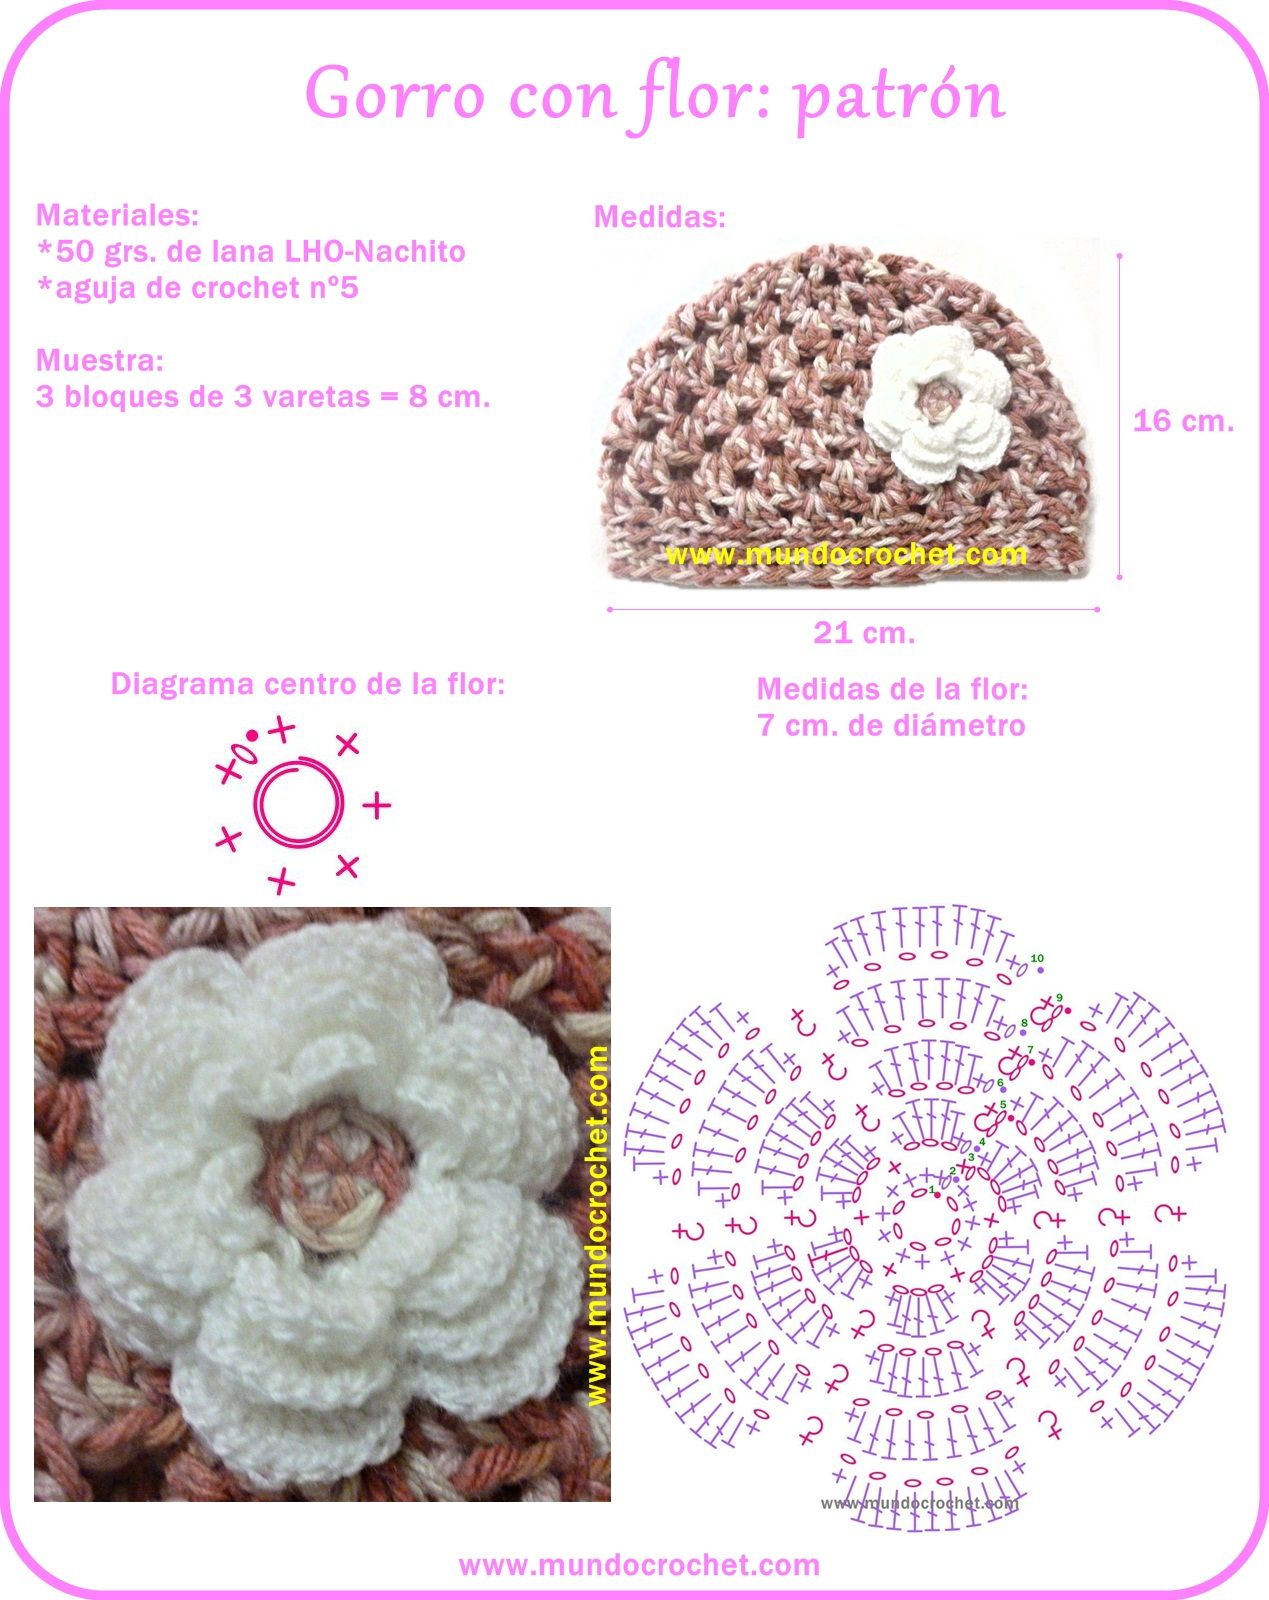 Gorro crochet | Crochet hat | Pinterest | Gorros, Crochet patrones y ...